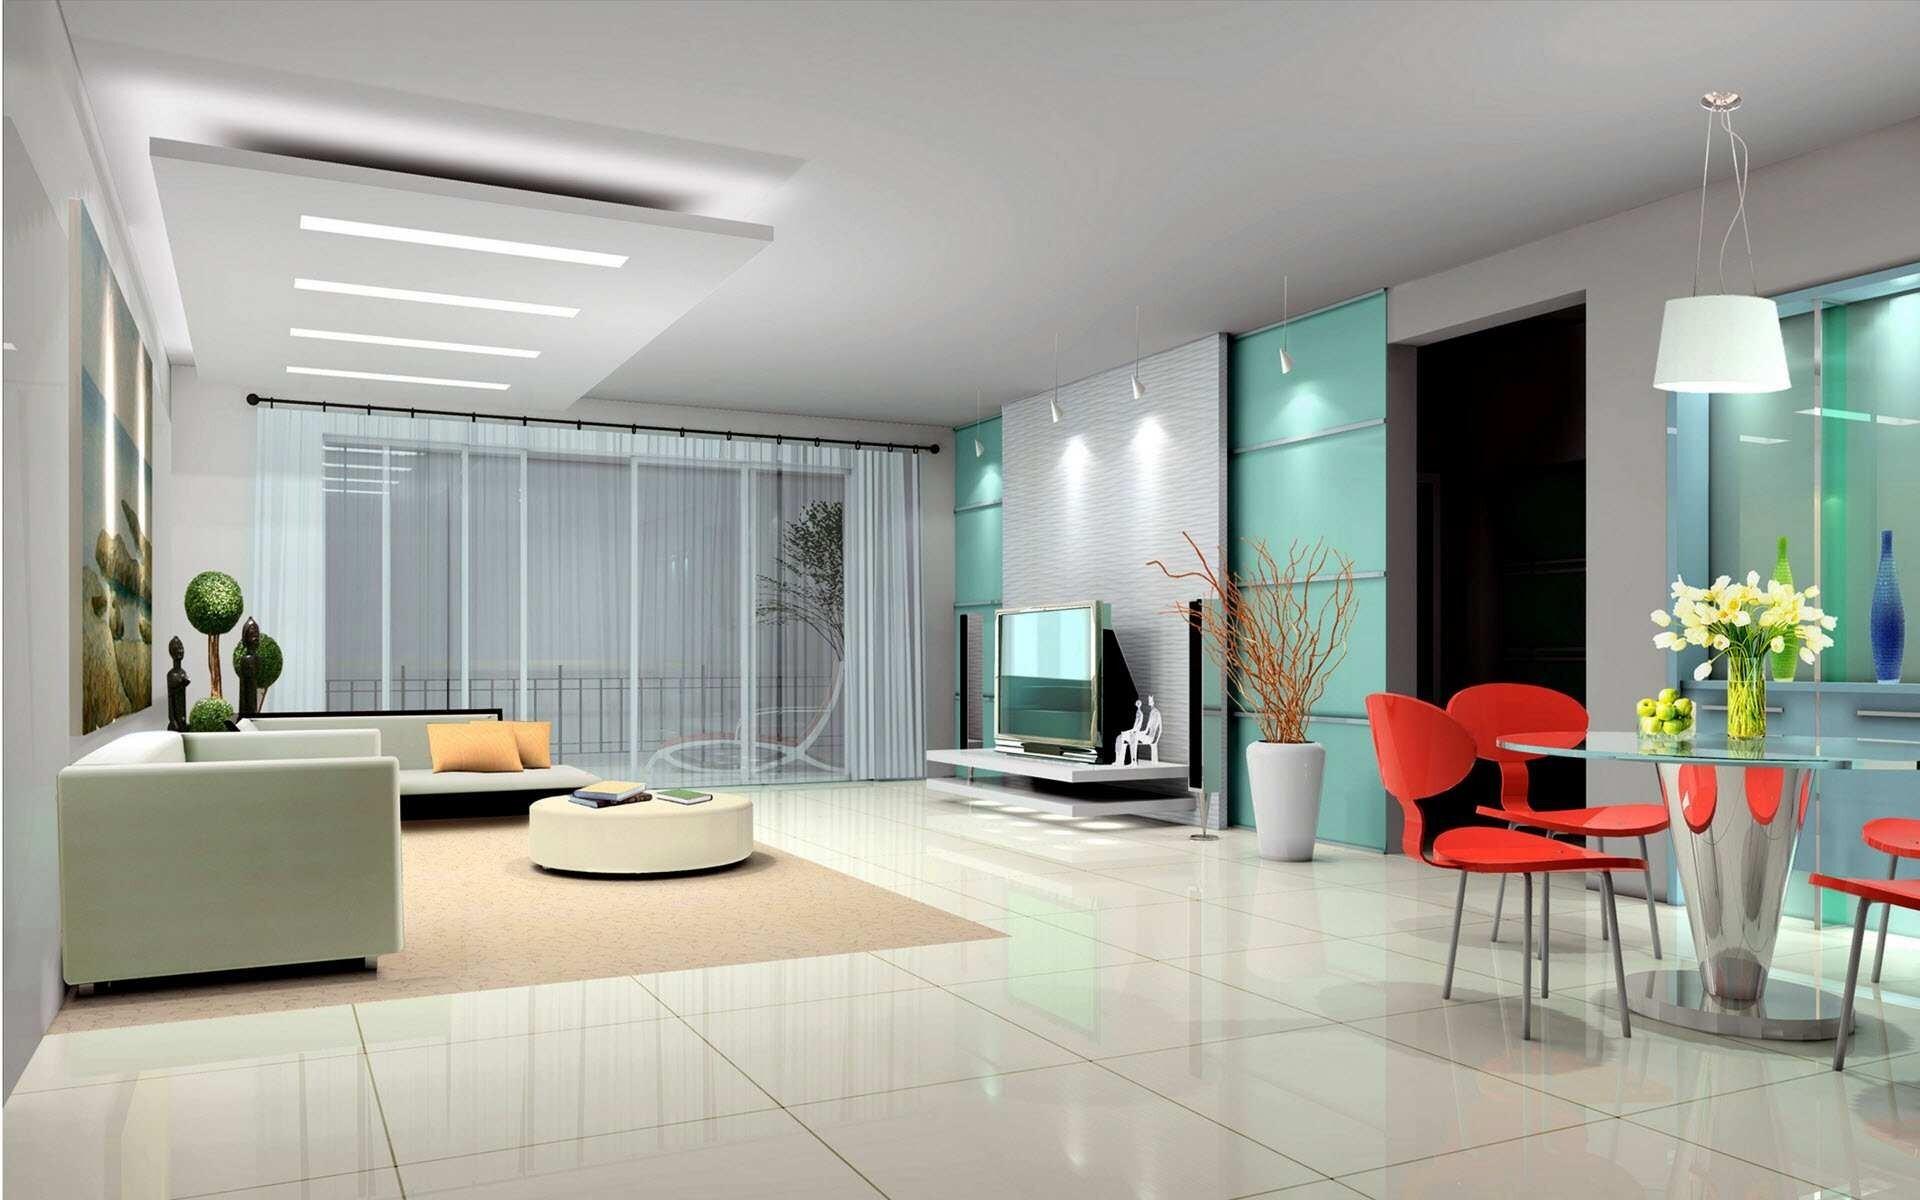 Amazing home interior design wallpaper hd wallpapers